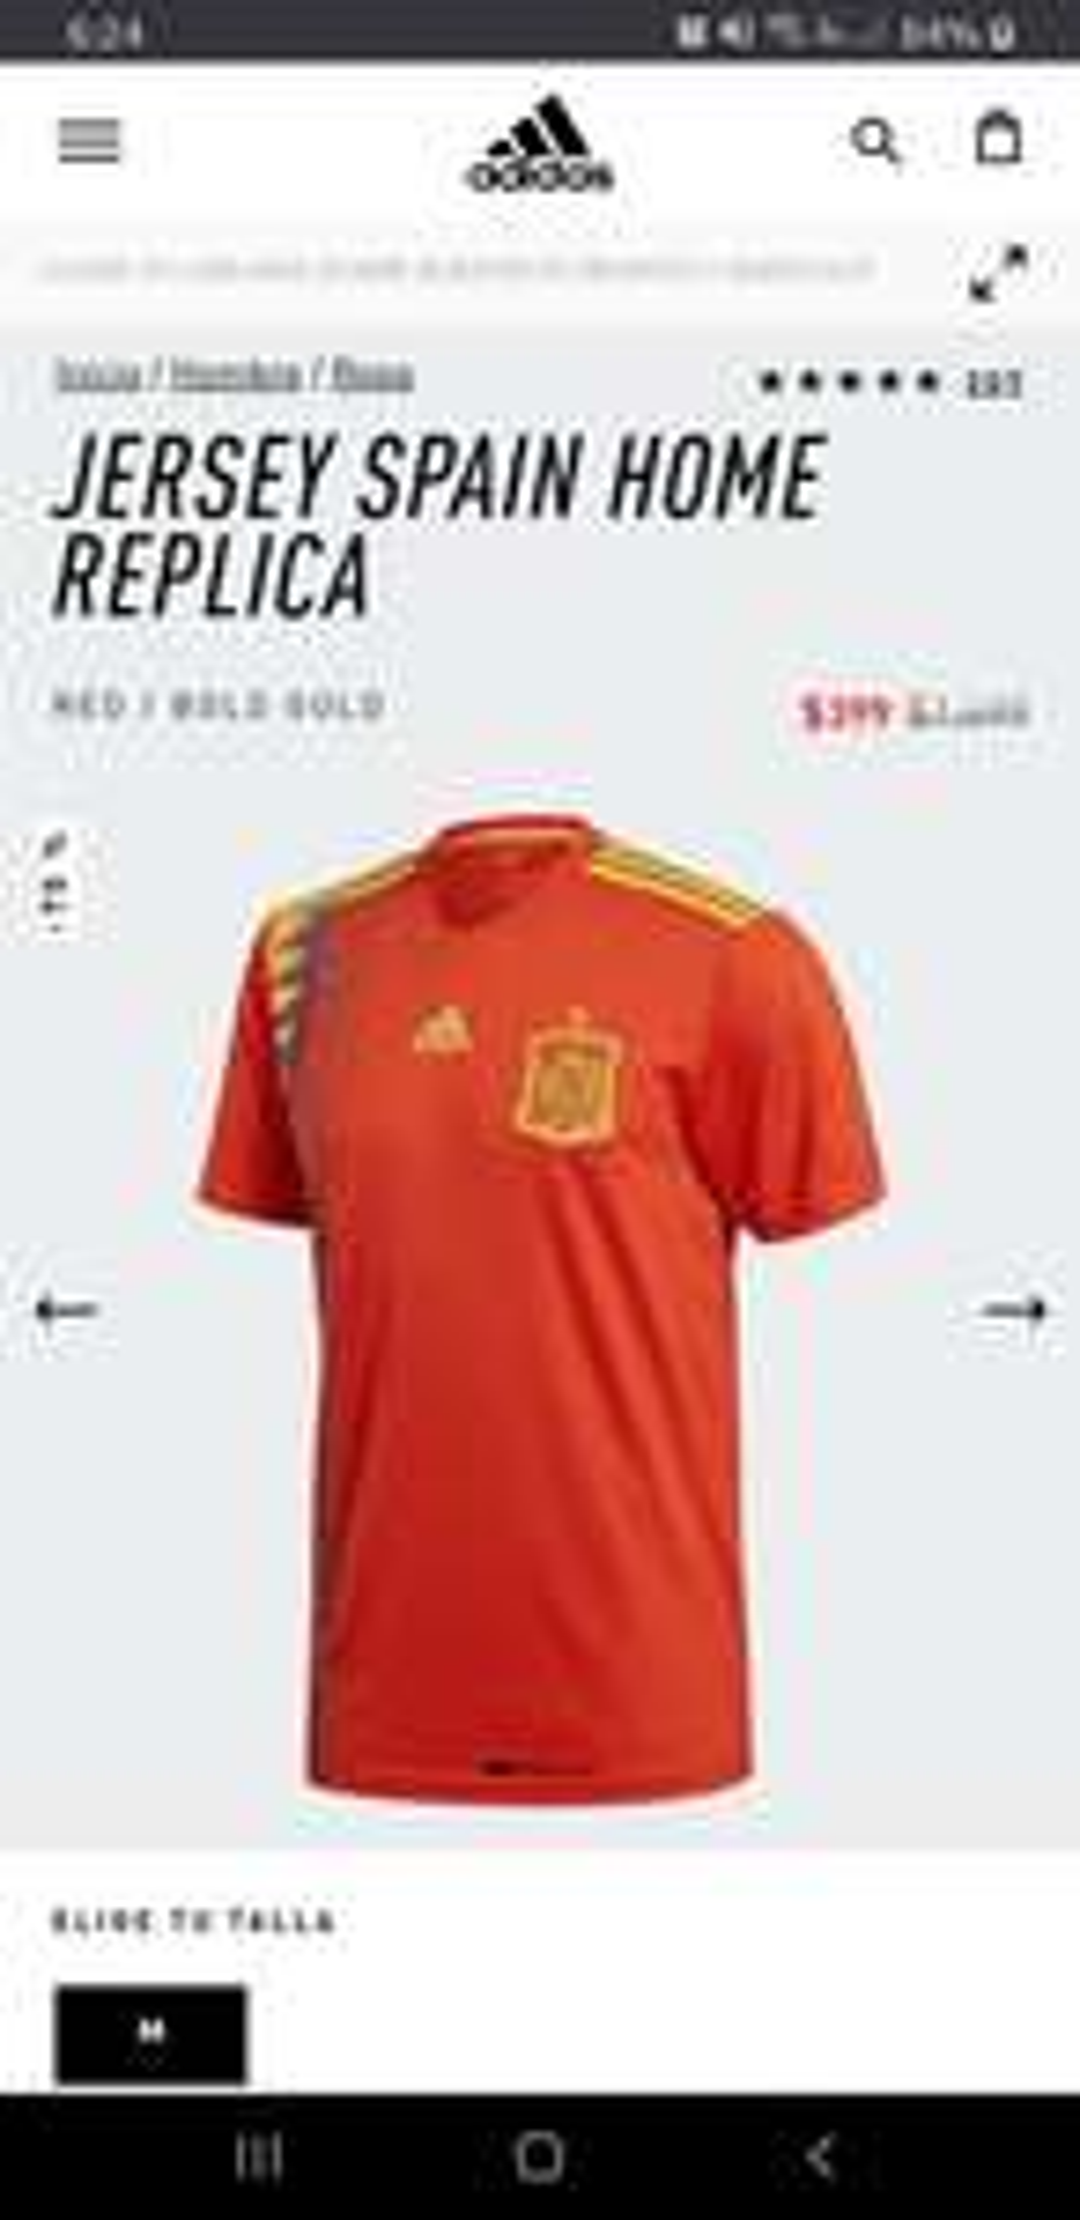 Adidas: Jersey de Fútbol España Réplica Talla M versión aficionado